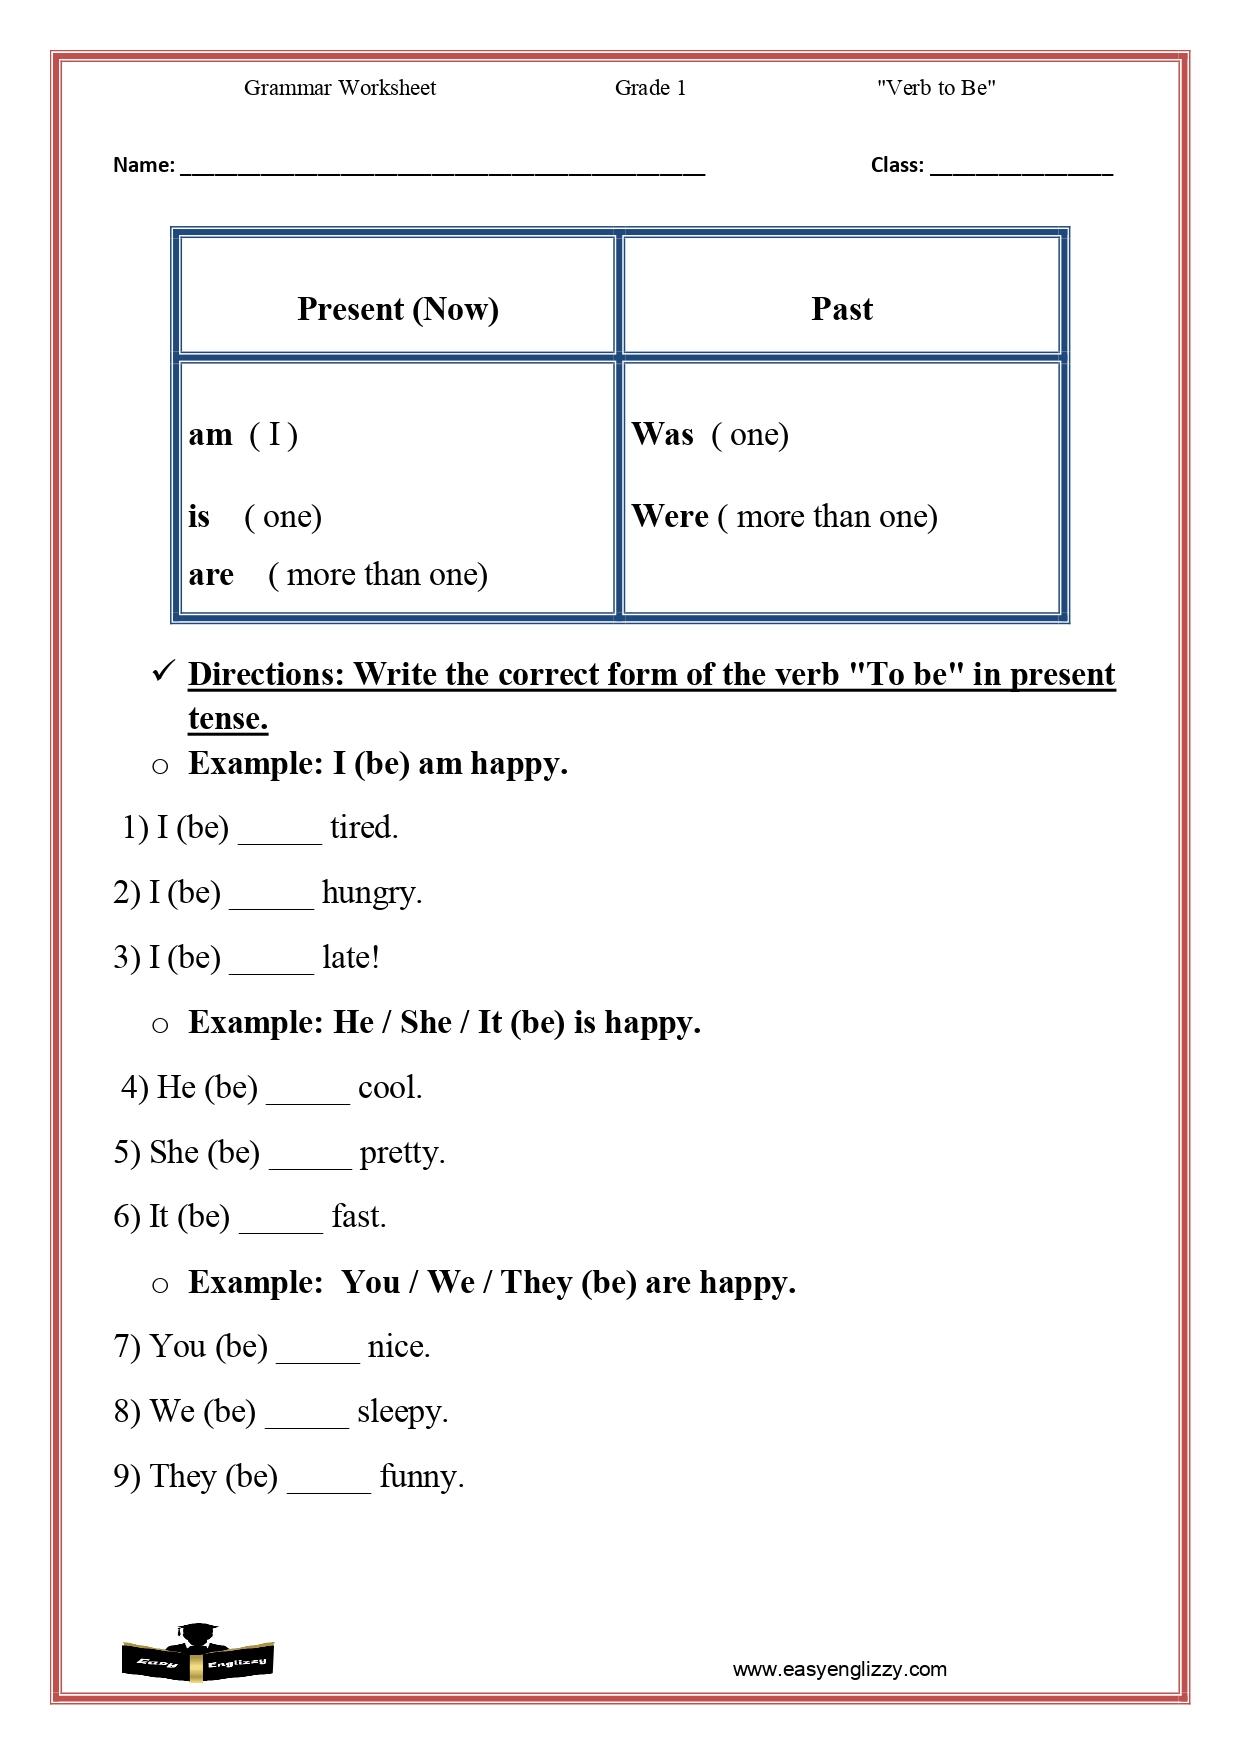 hight resolution of Worksheet On Grammar For Grade 1   robertdee.org